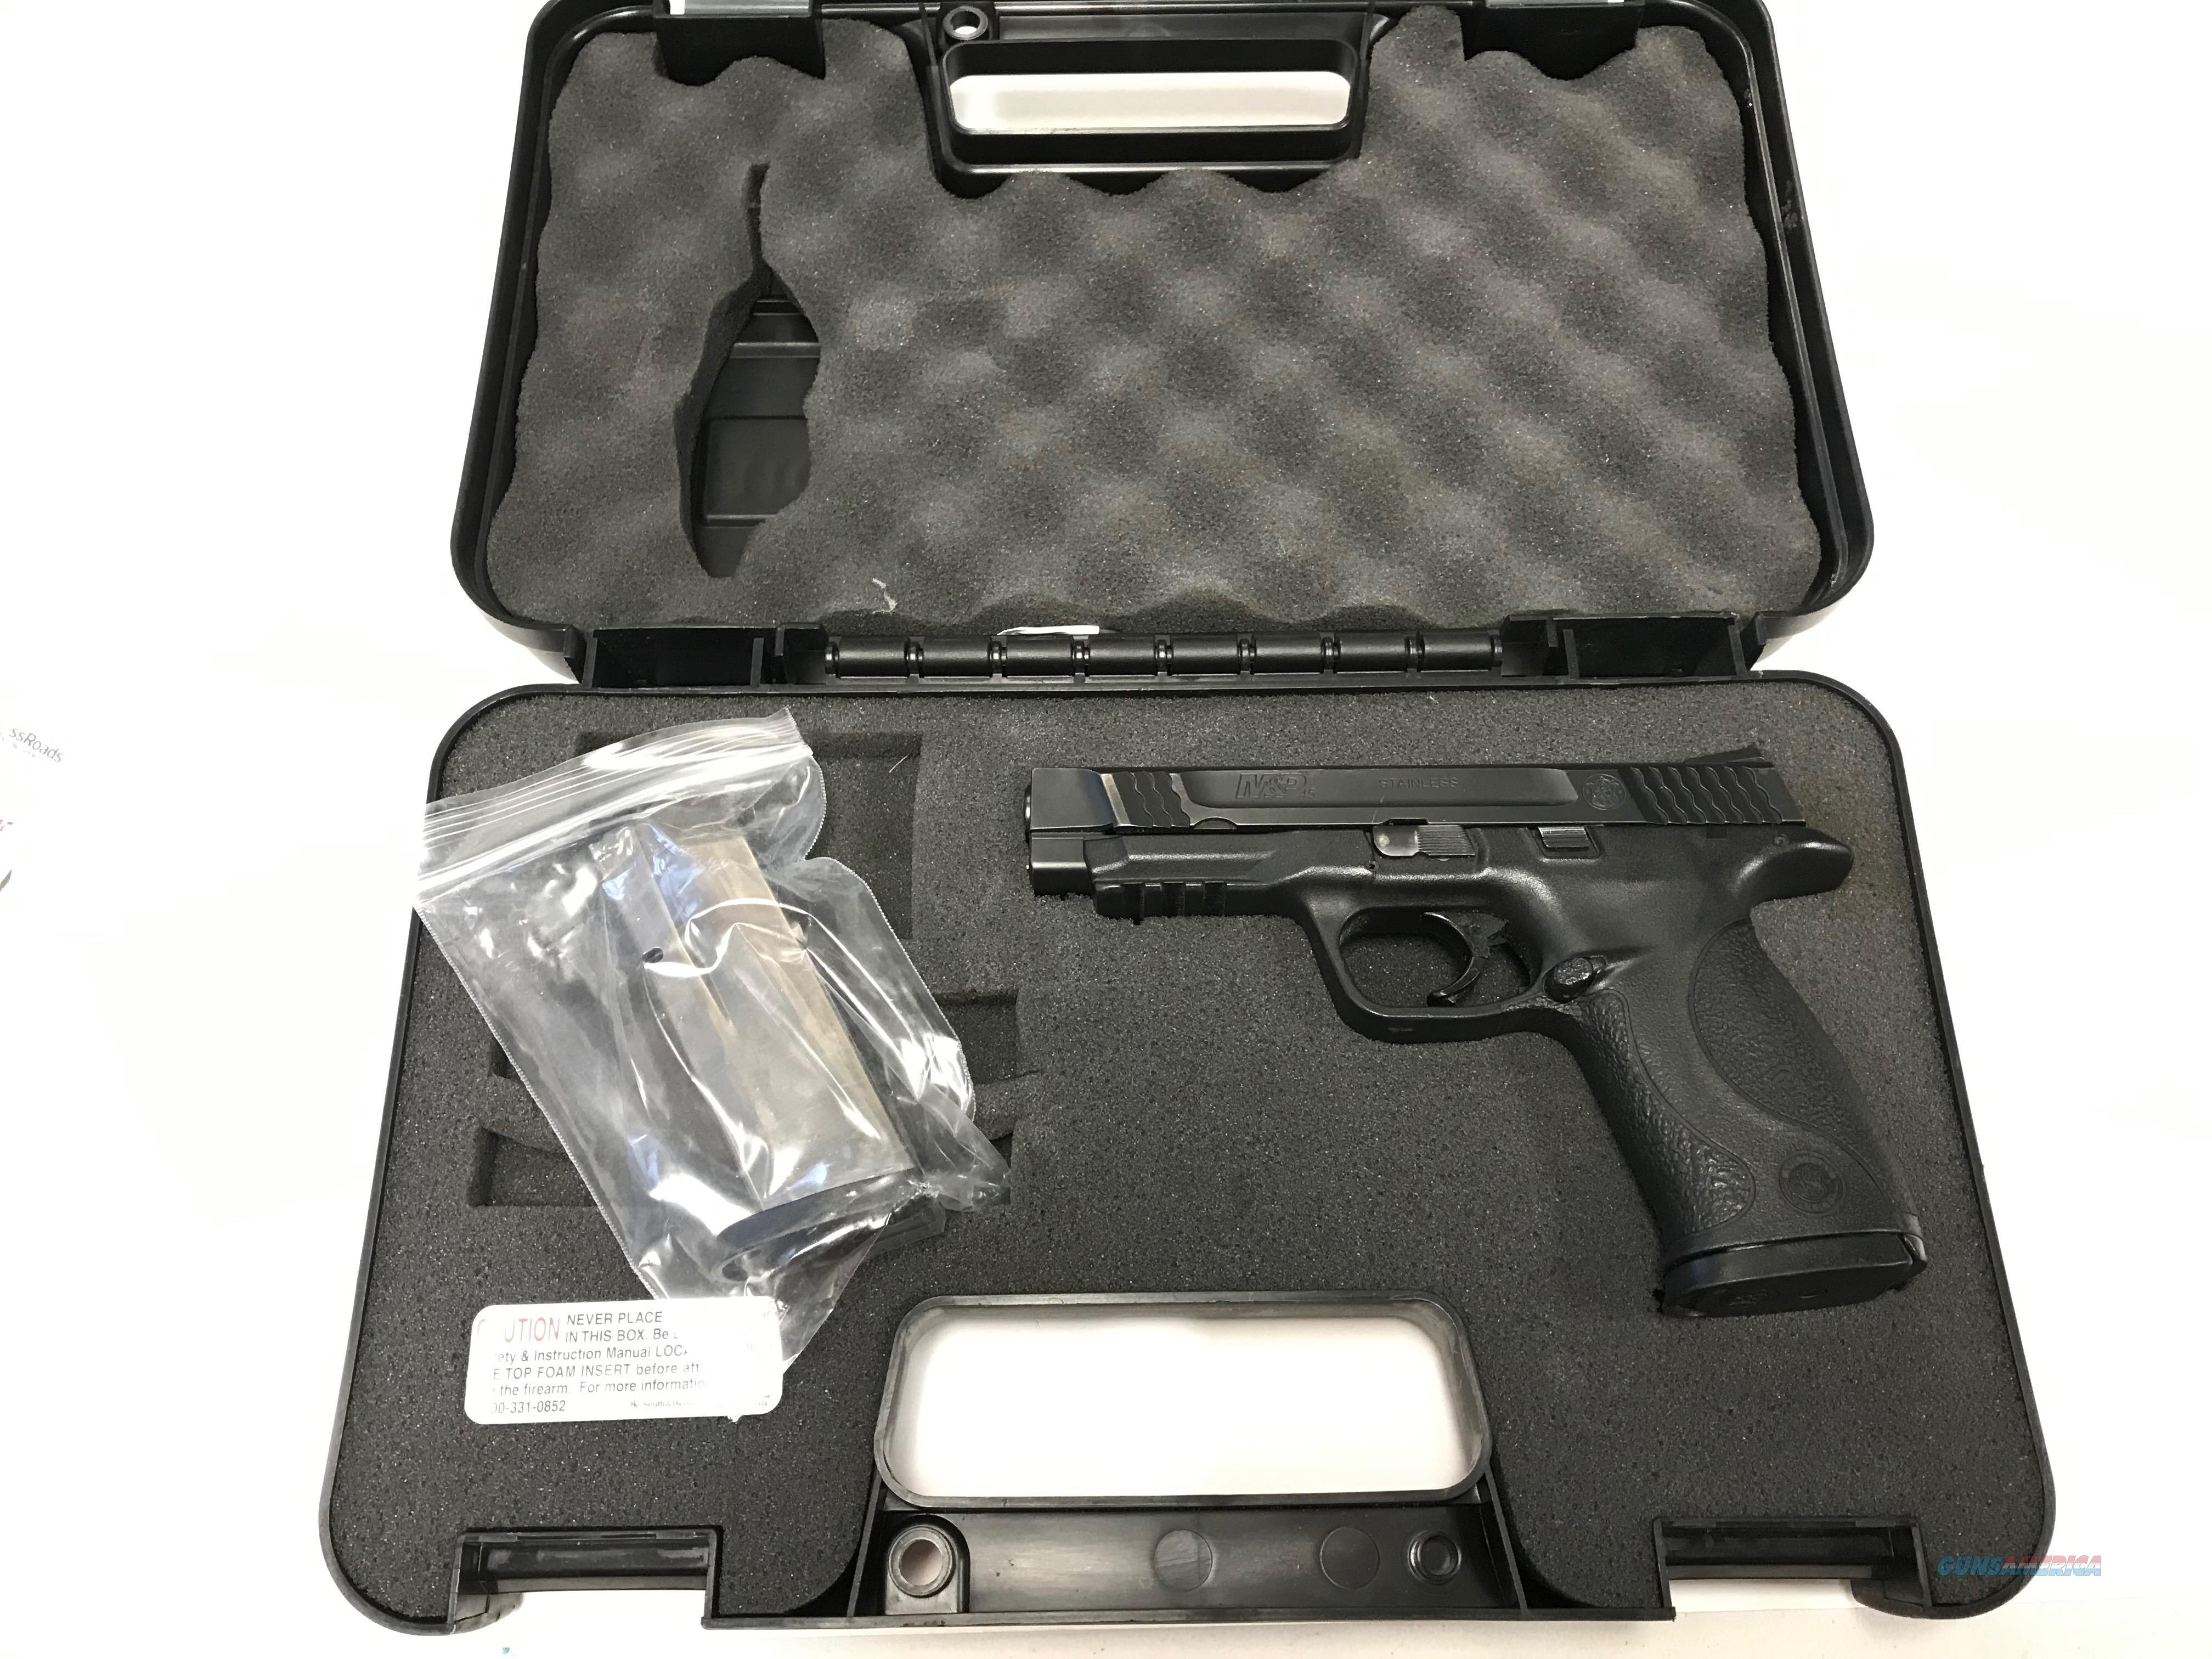 USED S&W M&P 45ACP Night Sights!  Guns > Pistols > Smith & Wesson Pistols - Autos > Polymer Frame